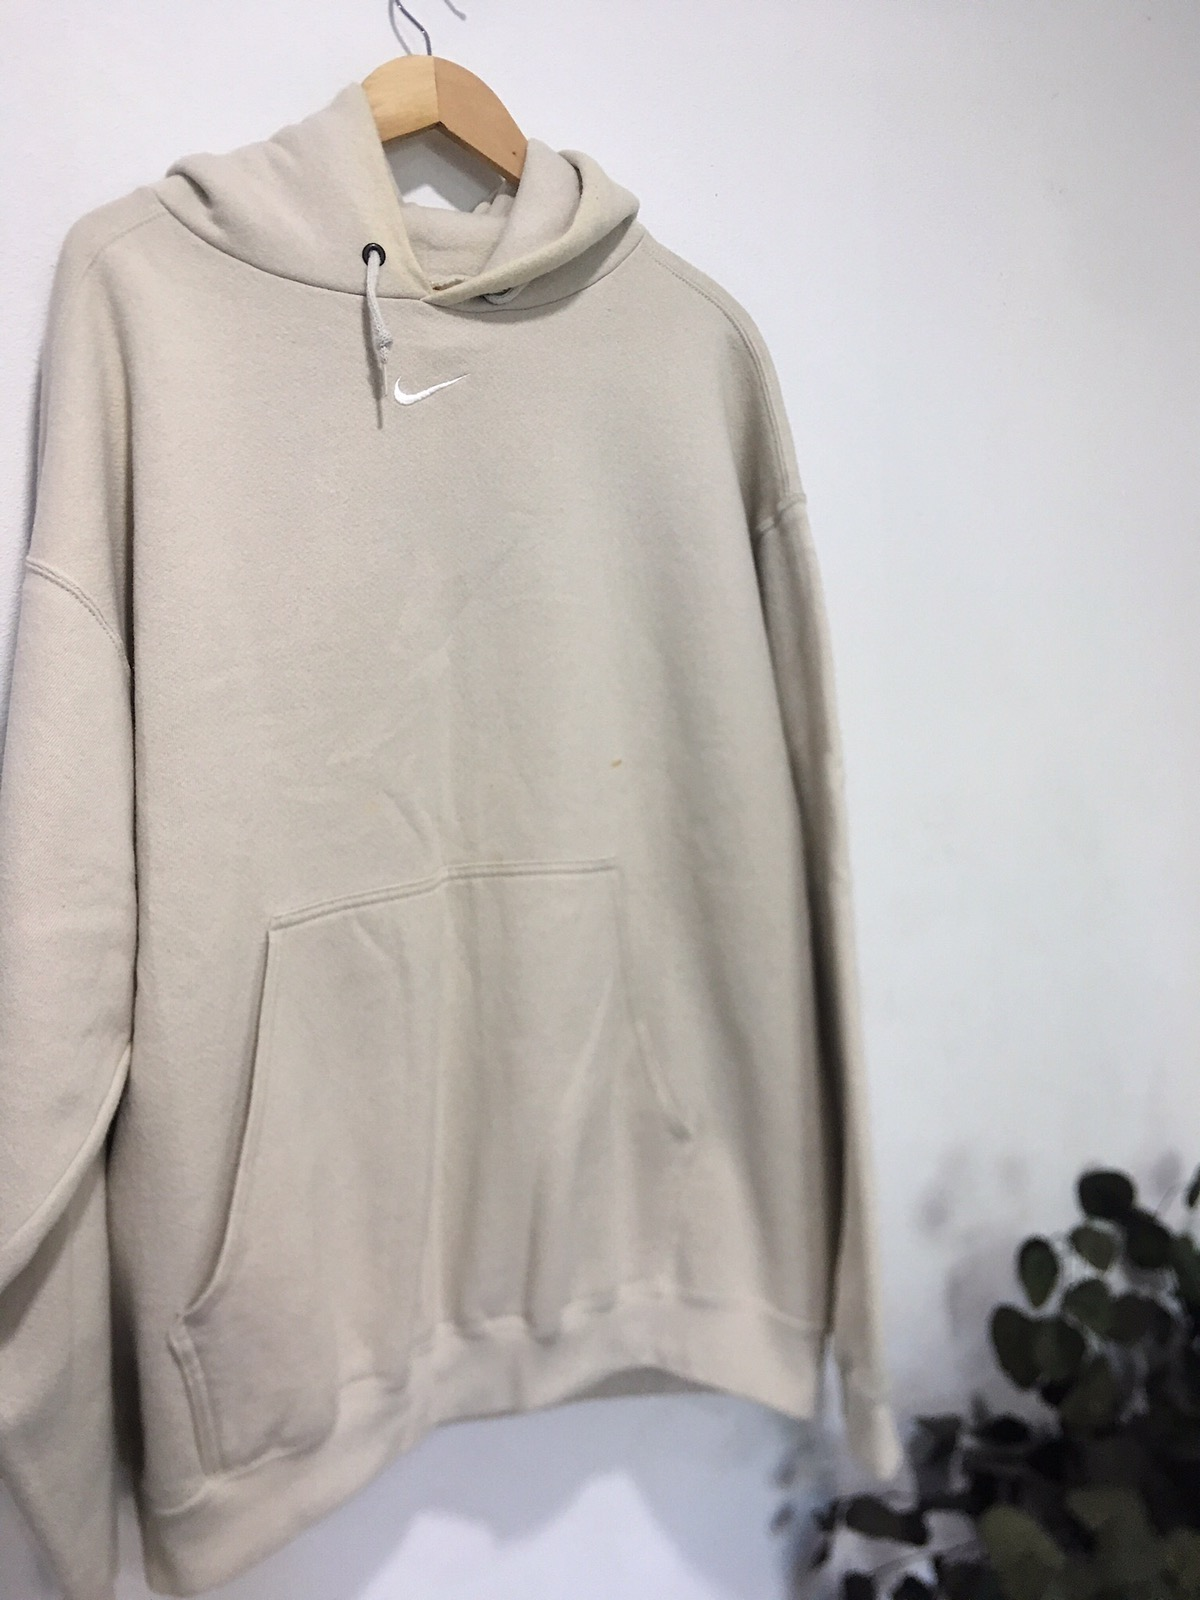 nike center swoosh hoodie